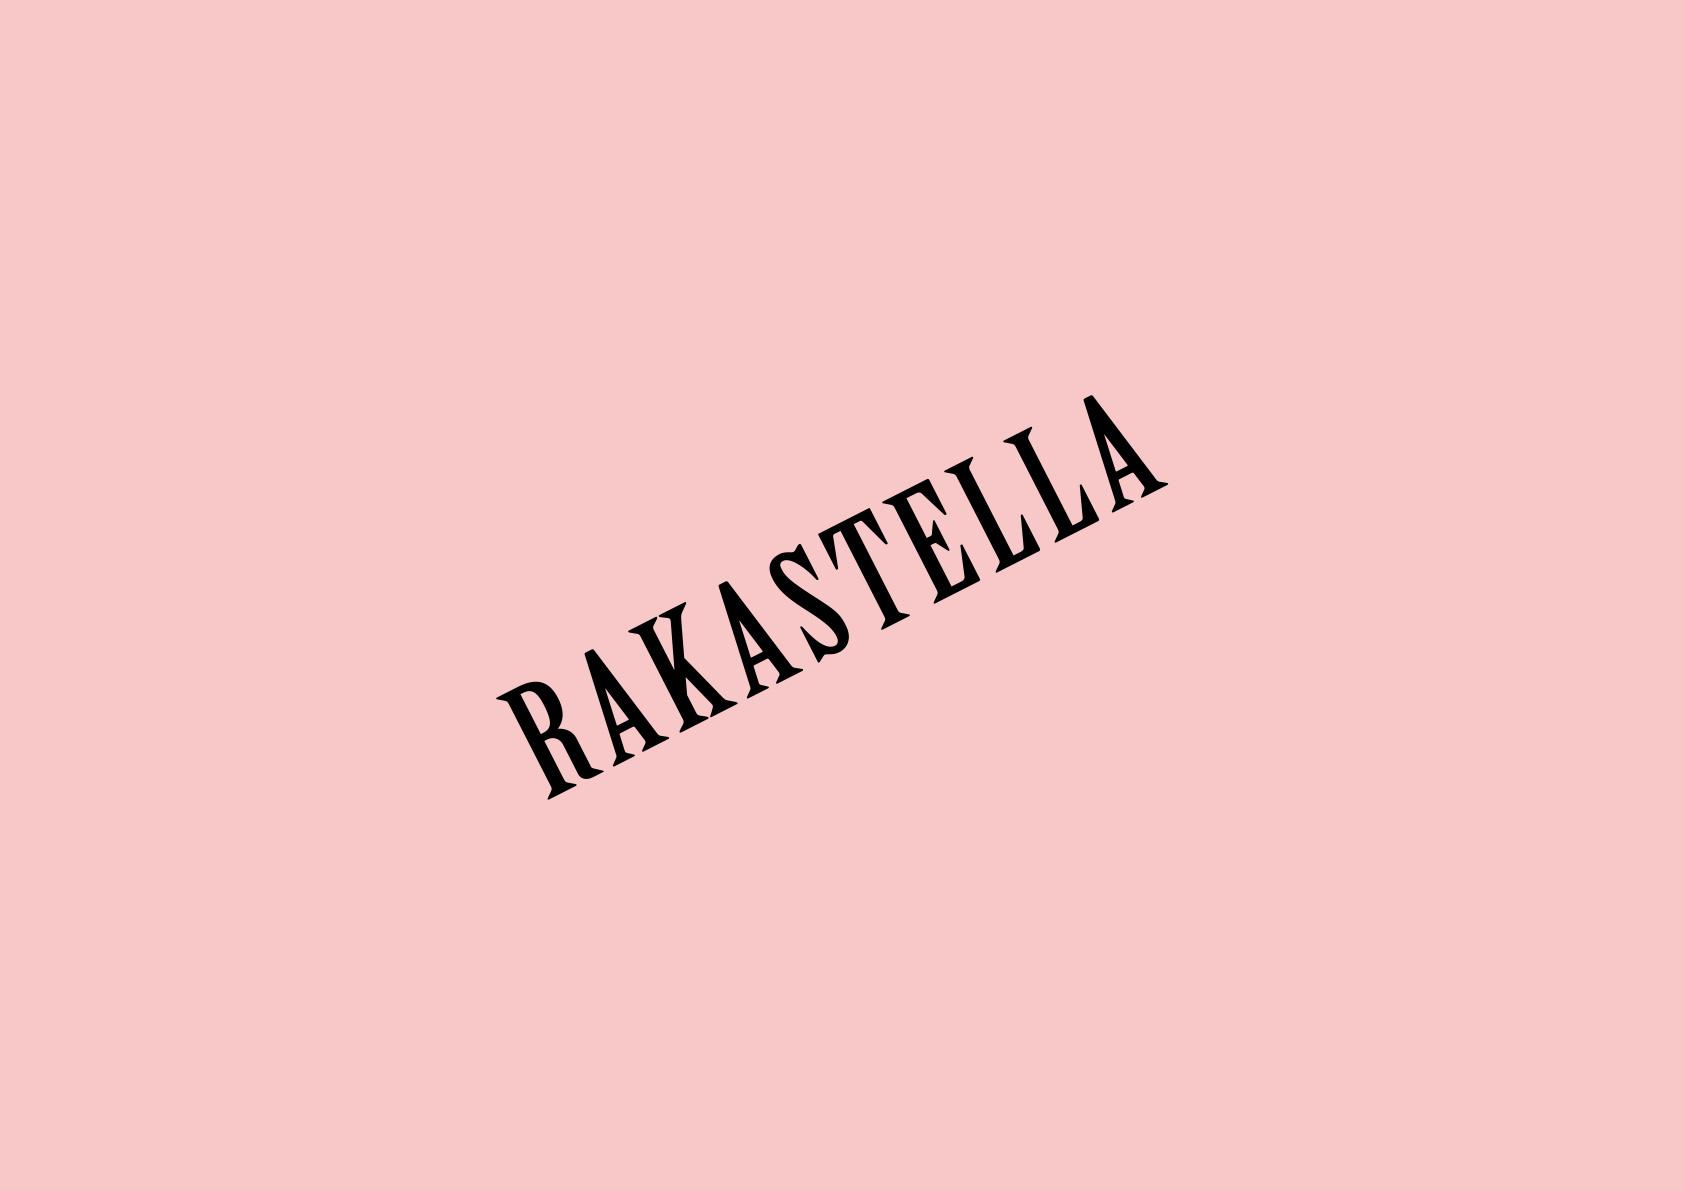 Rakastella_logo.jpg